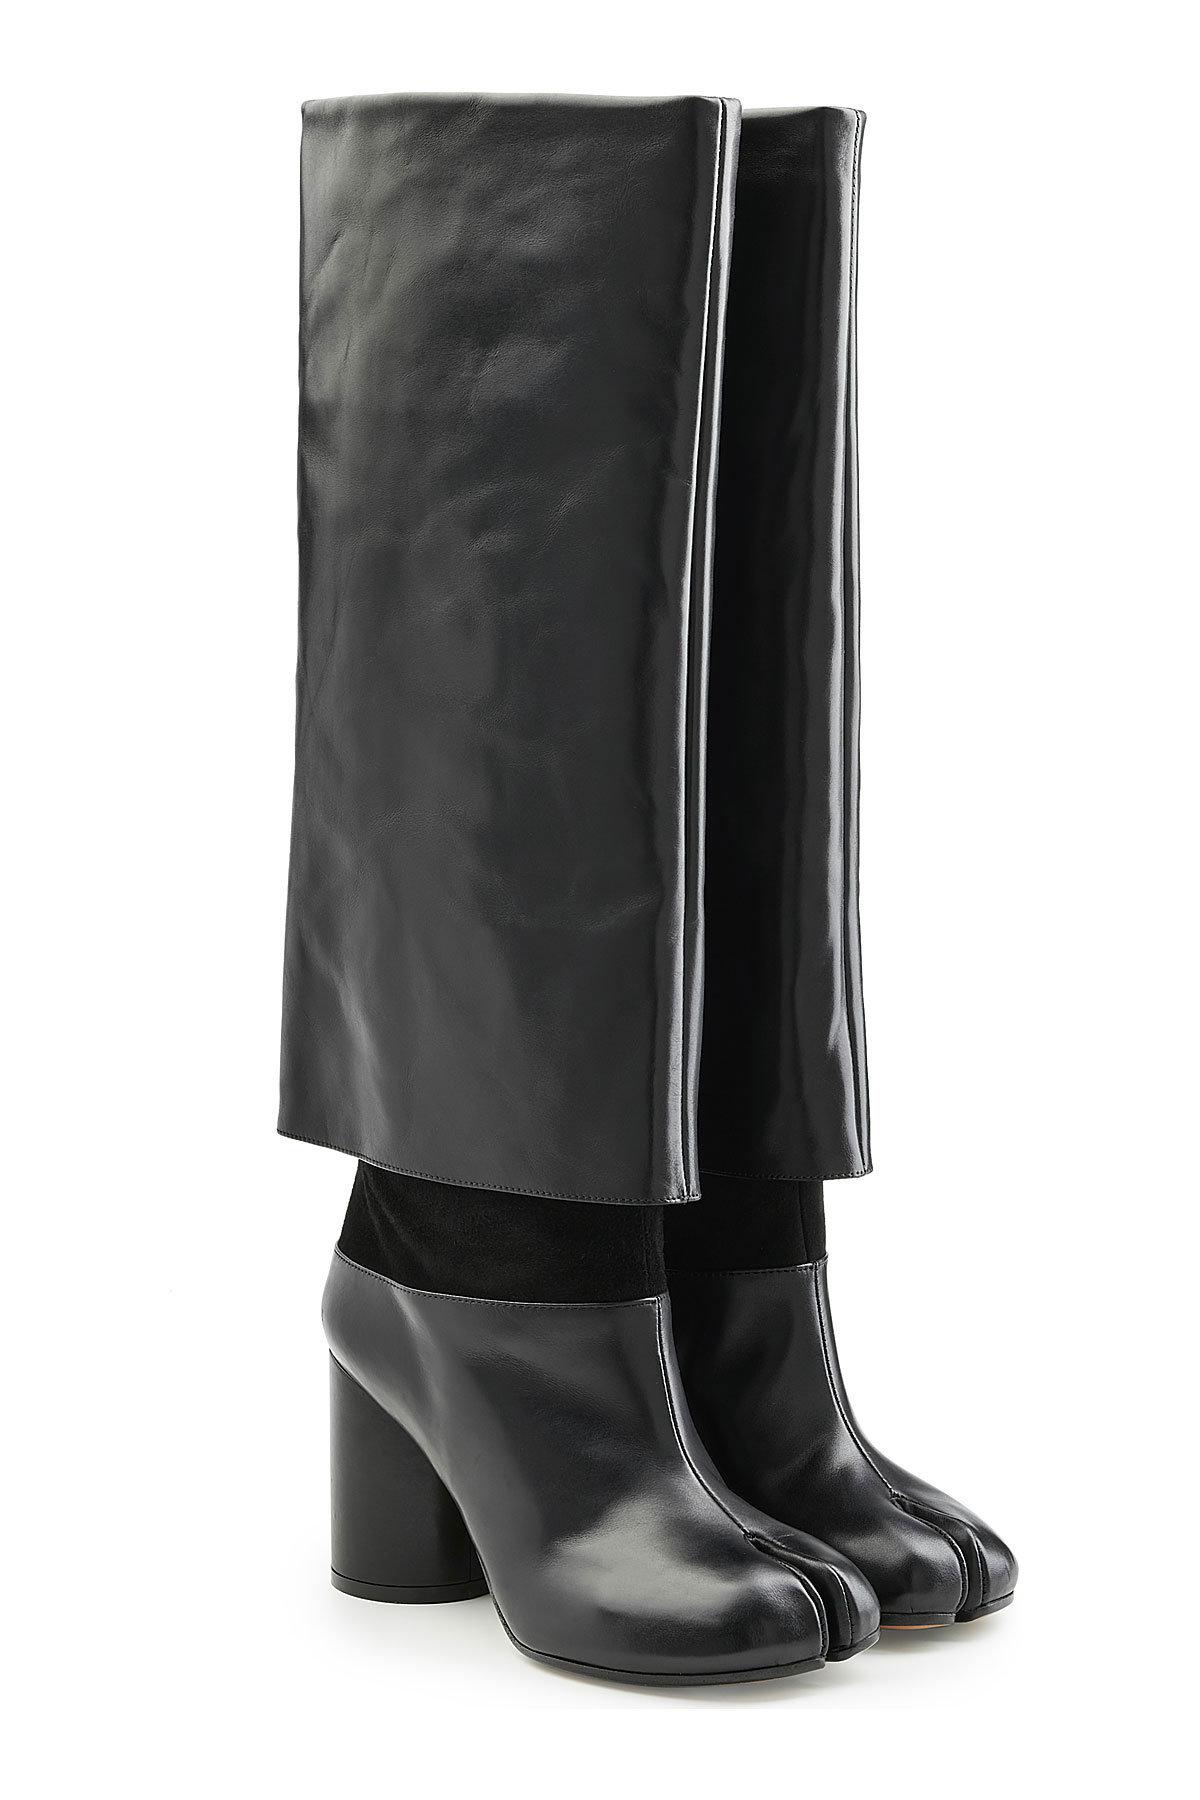 Maison Margiela Leather Knee Boots Gr. IT 39.5 2zRI1j0